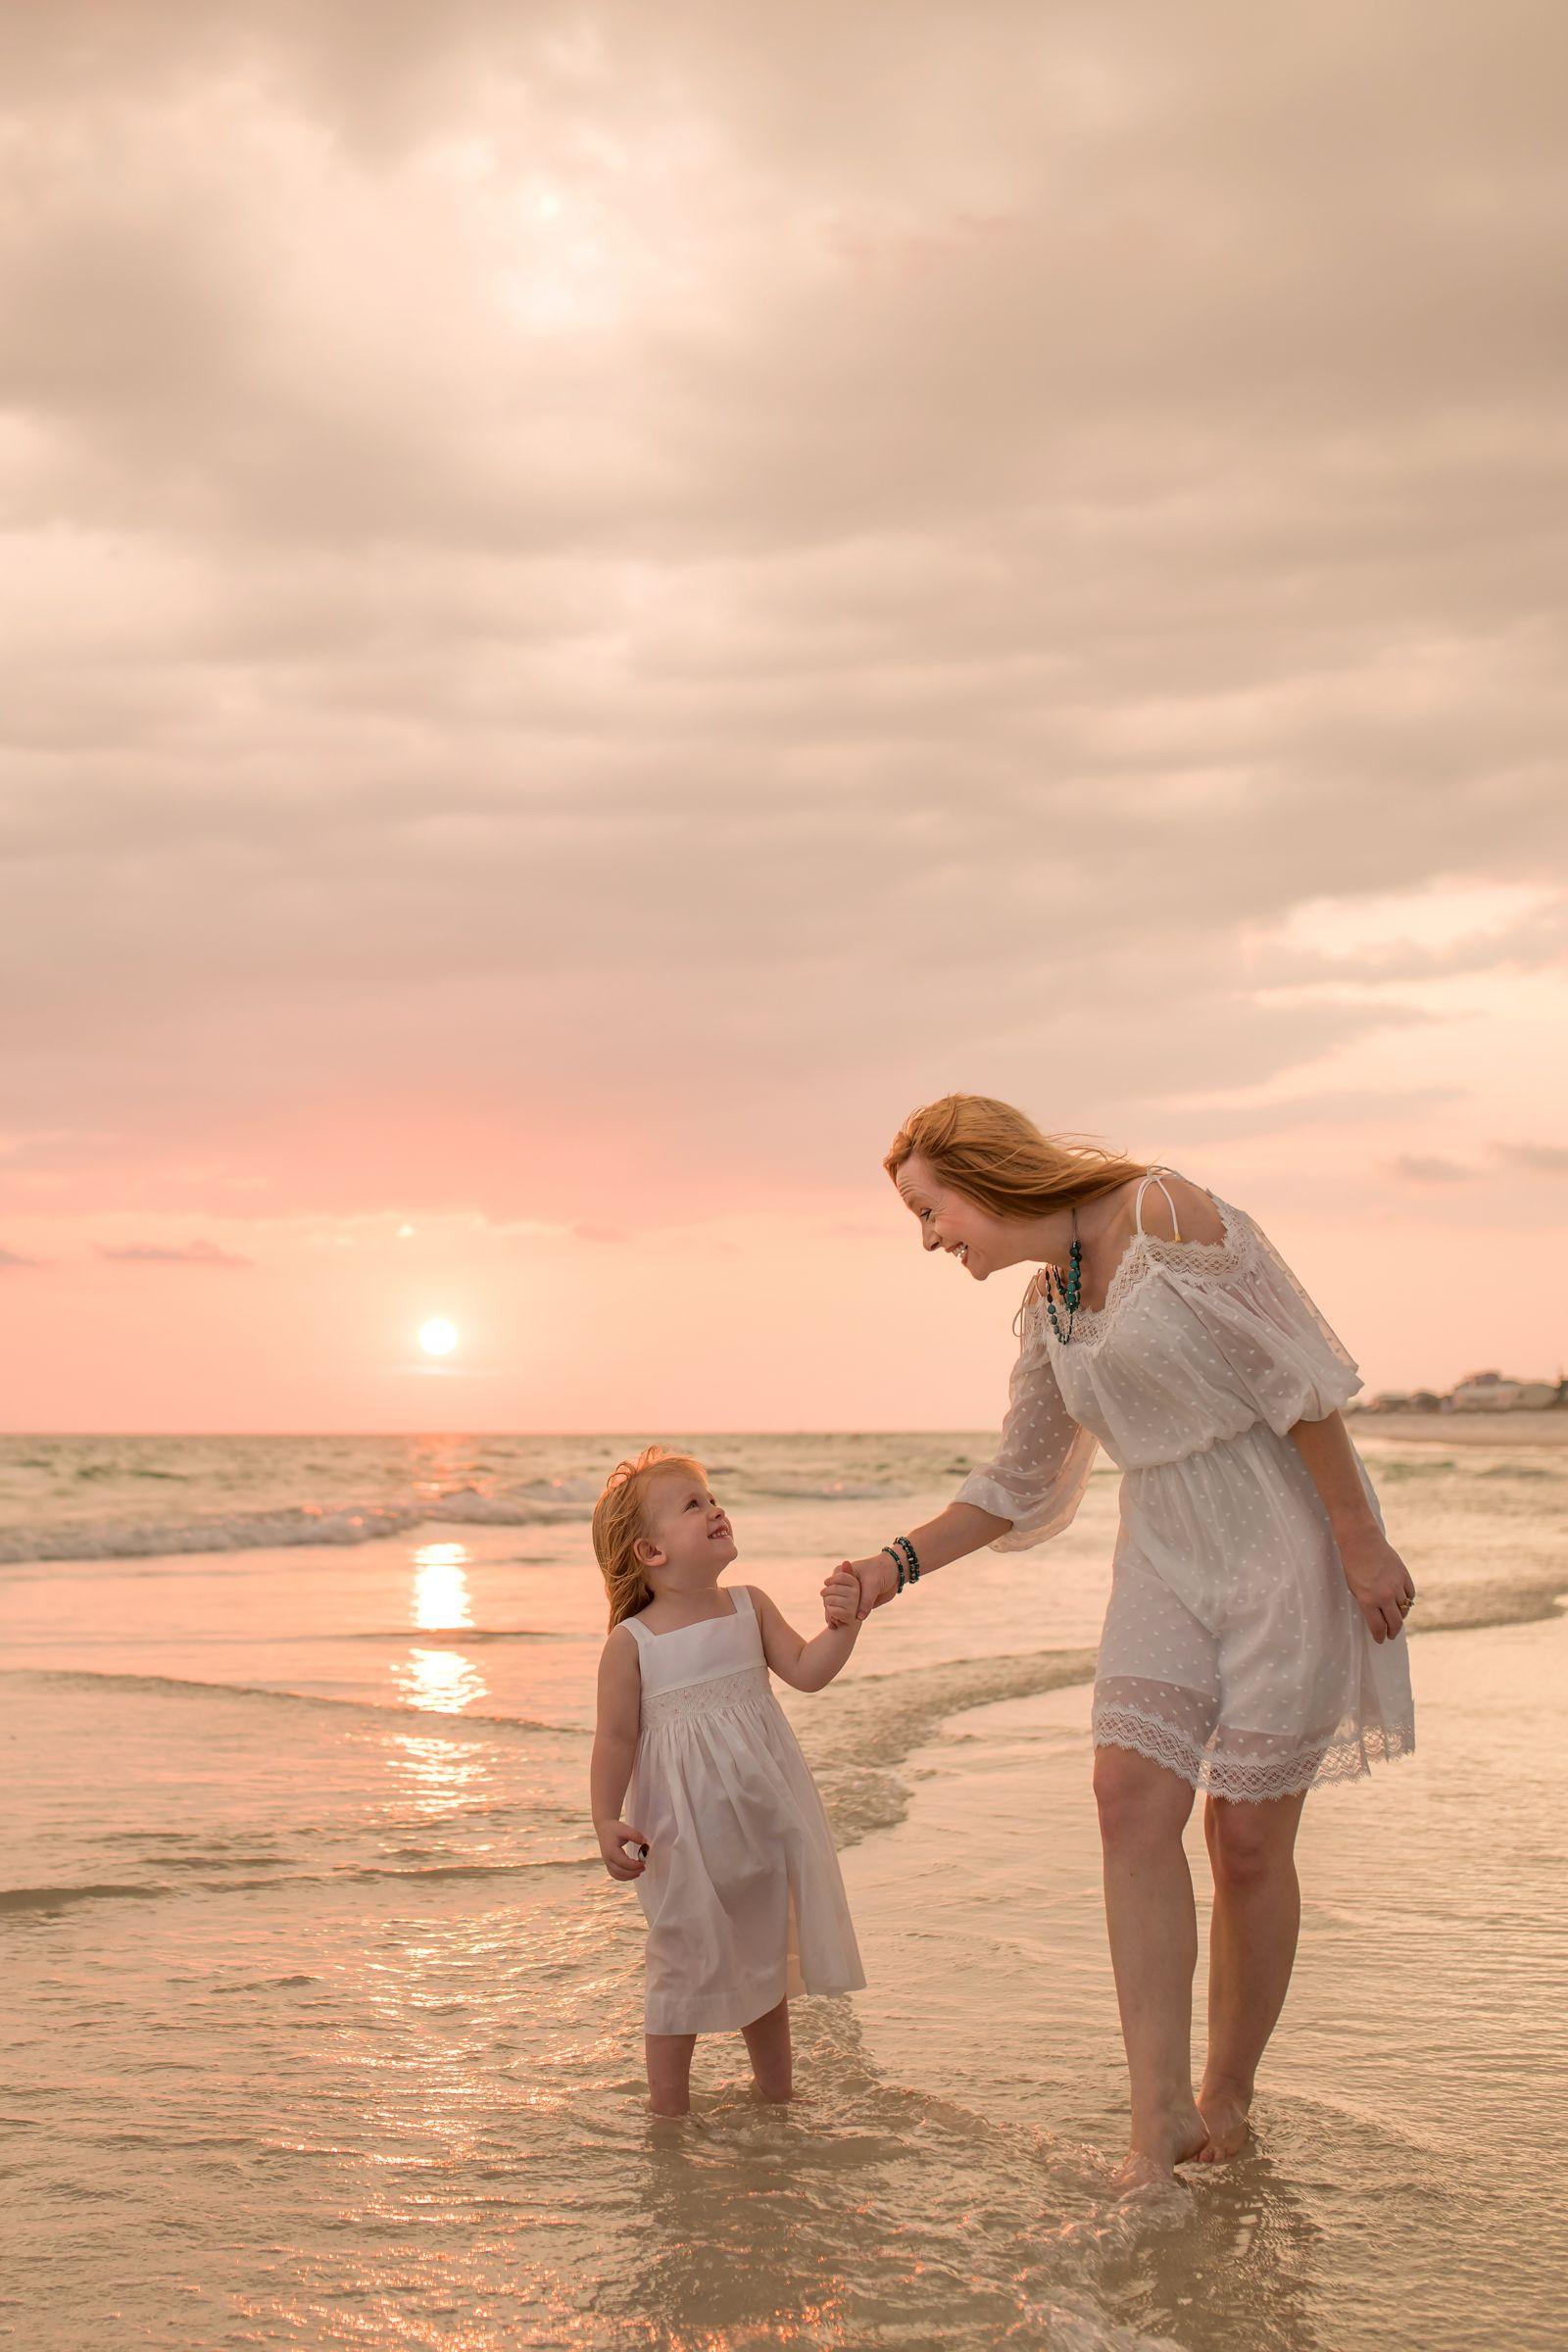 Beach Family Photographs - LJennings Photography | Family